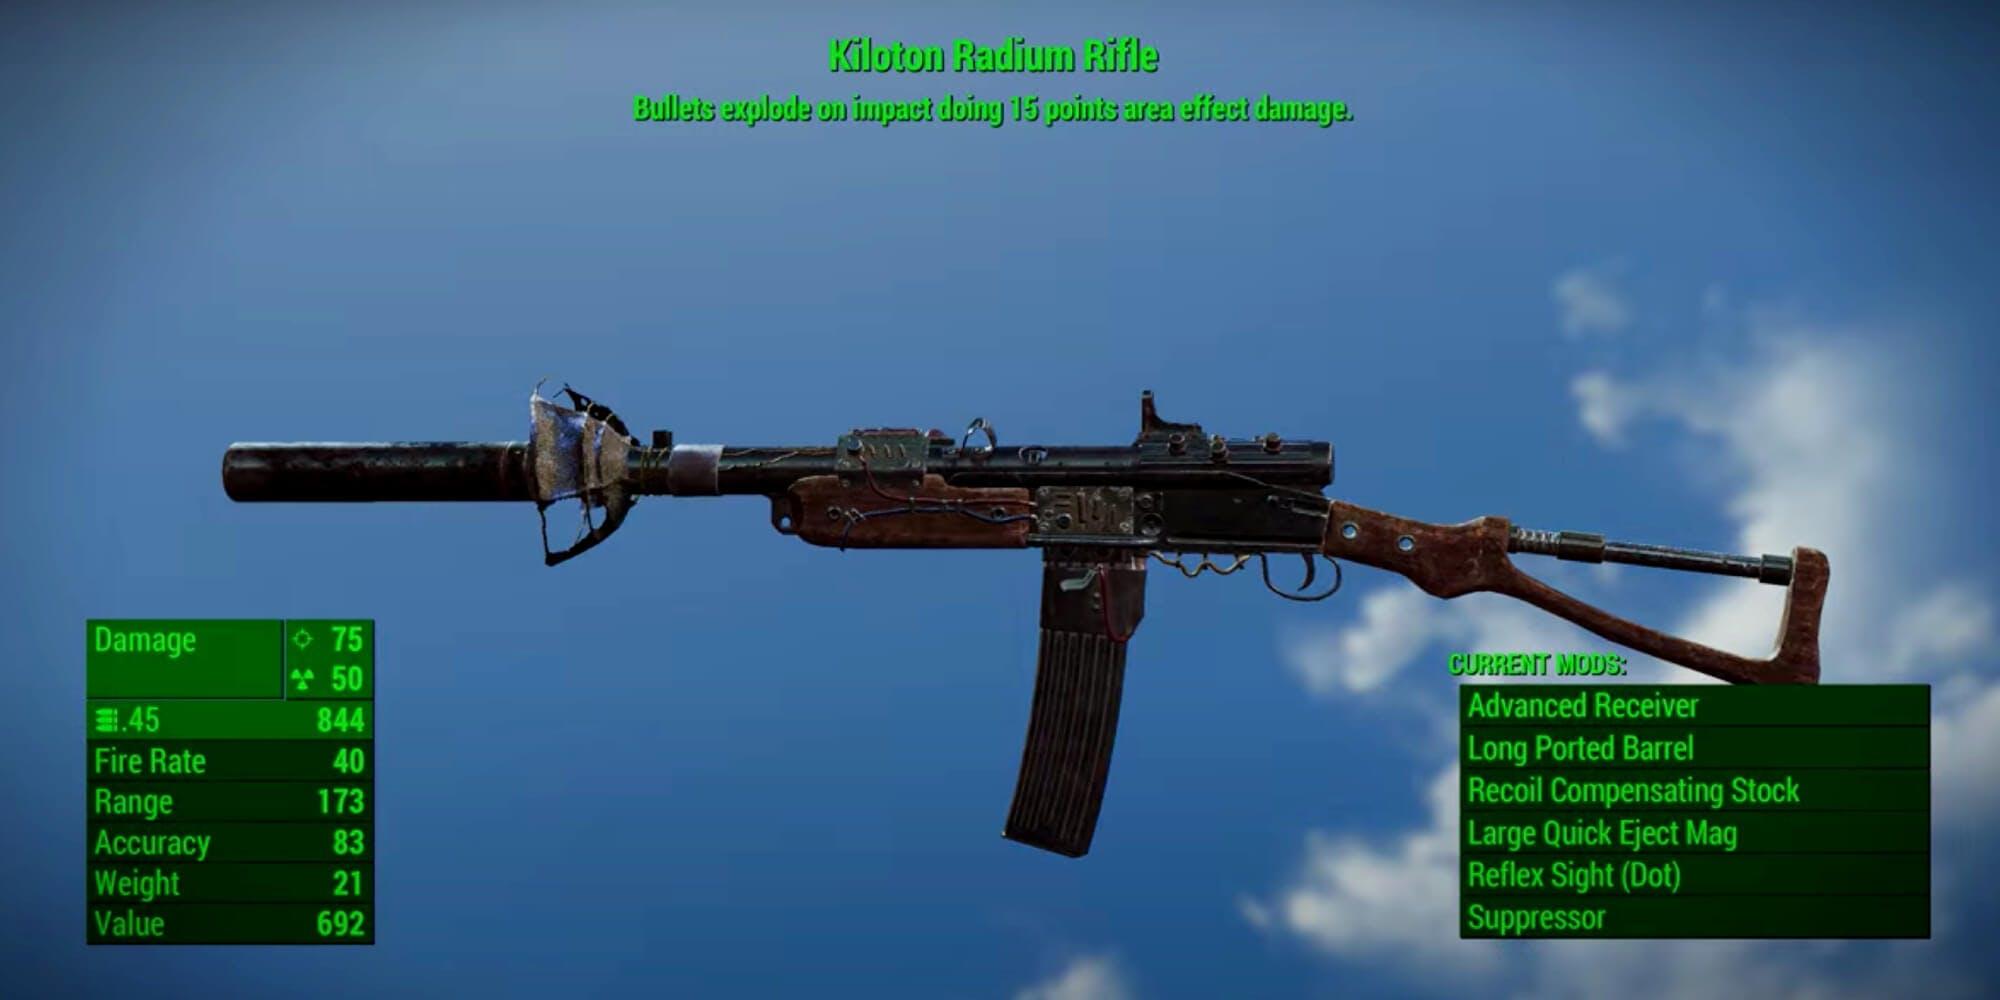 Fallout 4 weapons - Kiloton Radium Rifle